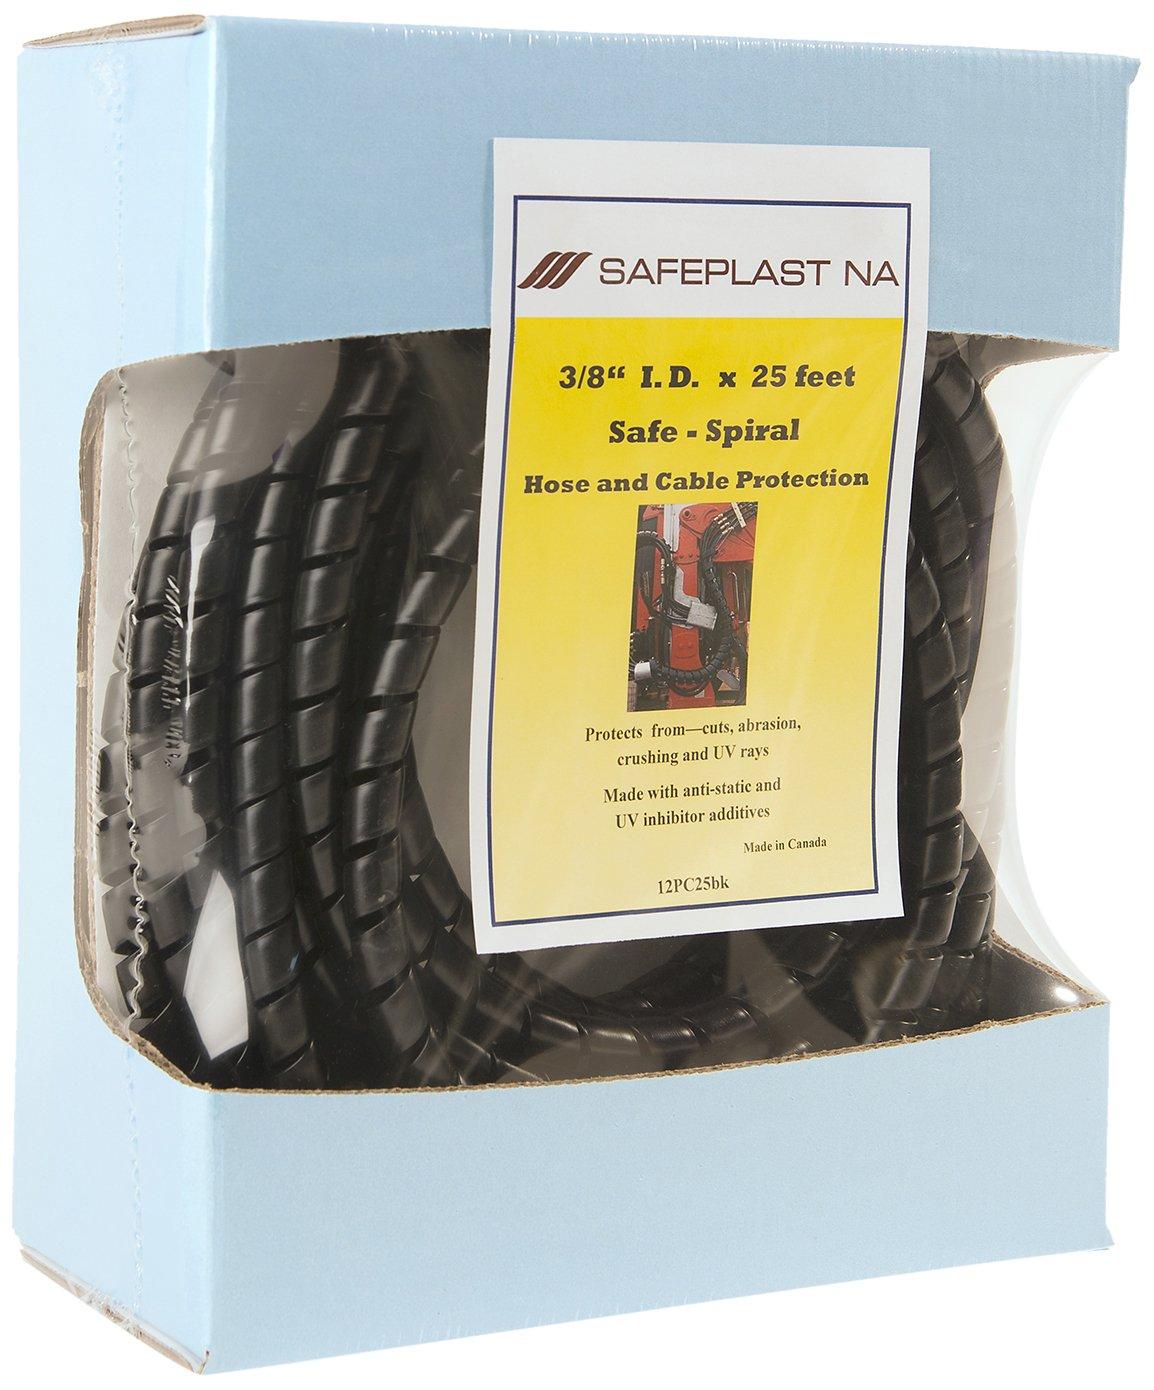 Pre-Cut Spiral Wrap Hose Protector, 3/8' I.D., 25' Length, Black 3/8 I.D. 25' Length Safeplast NA Company Ltd. 12PC25bk